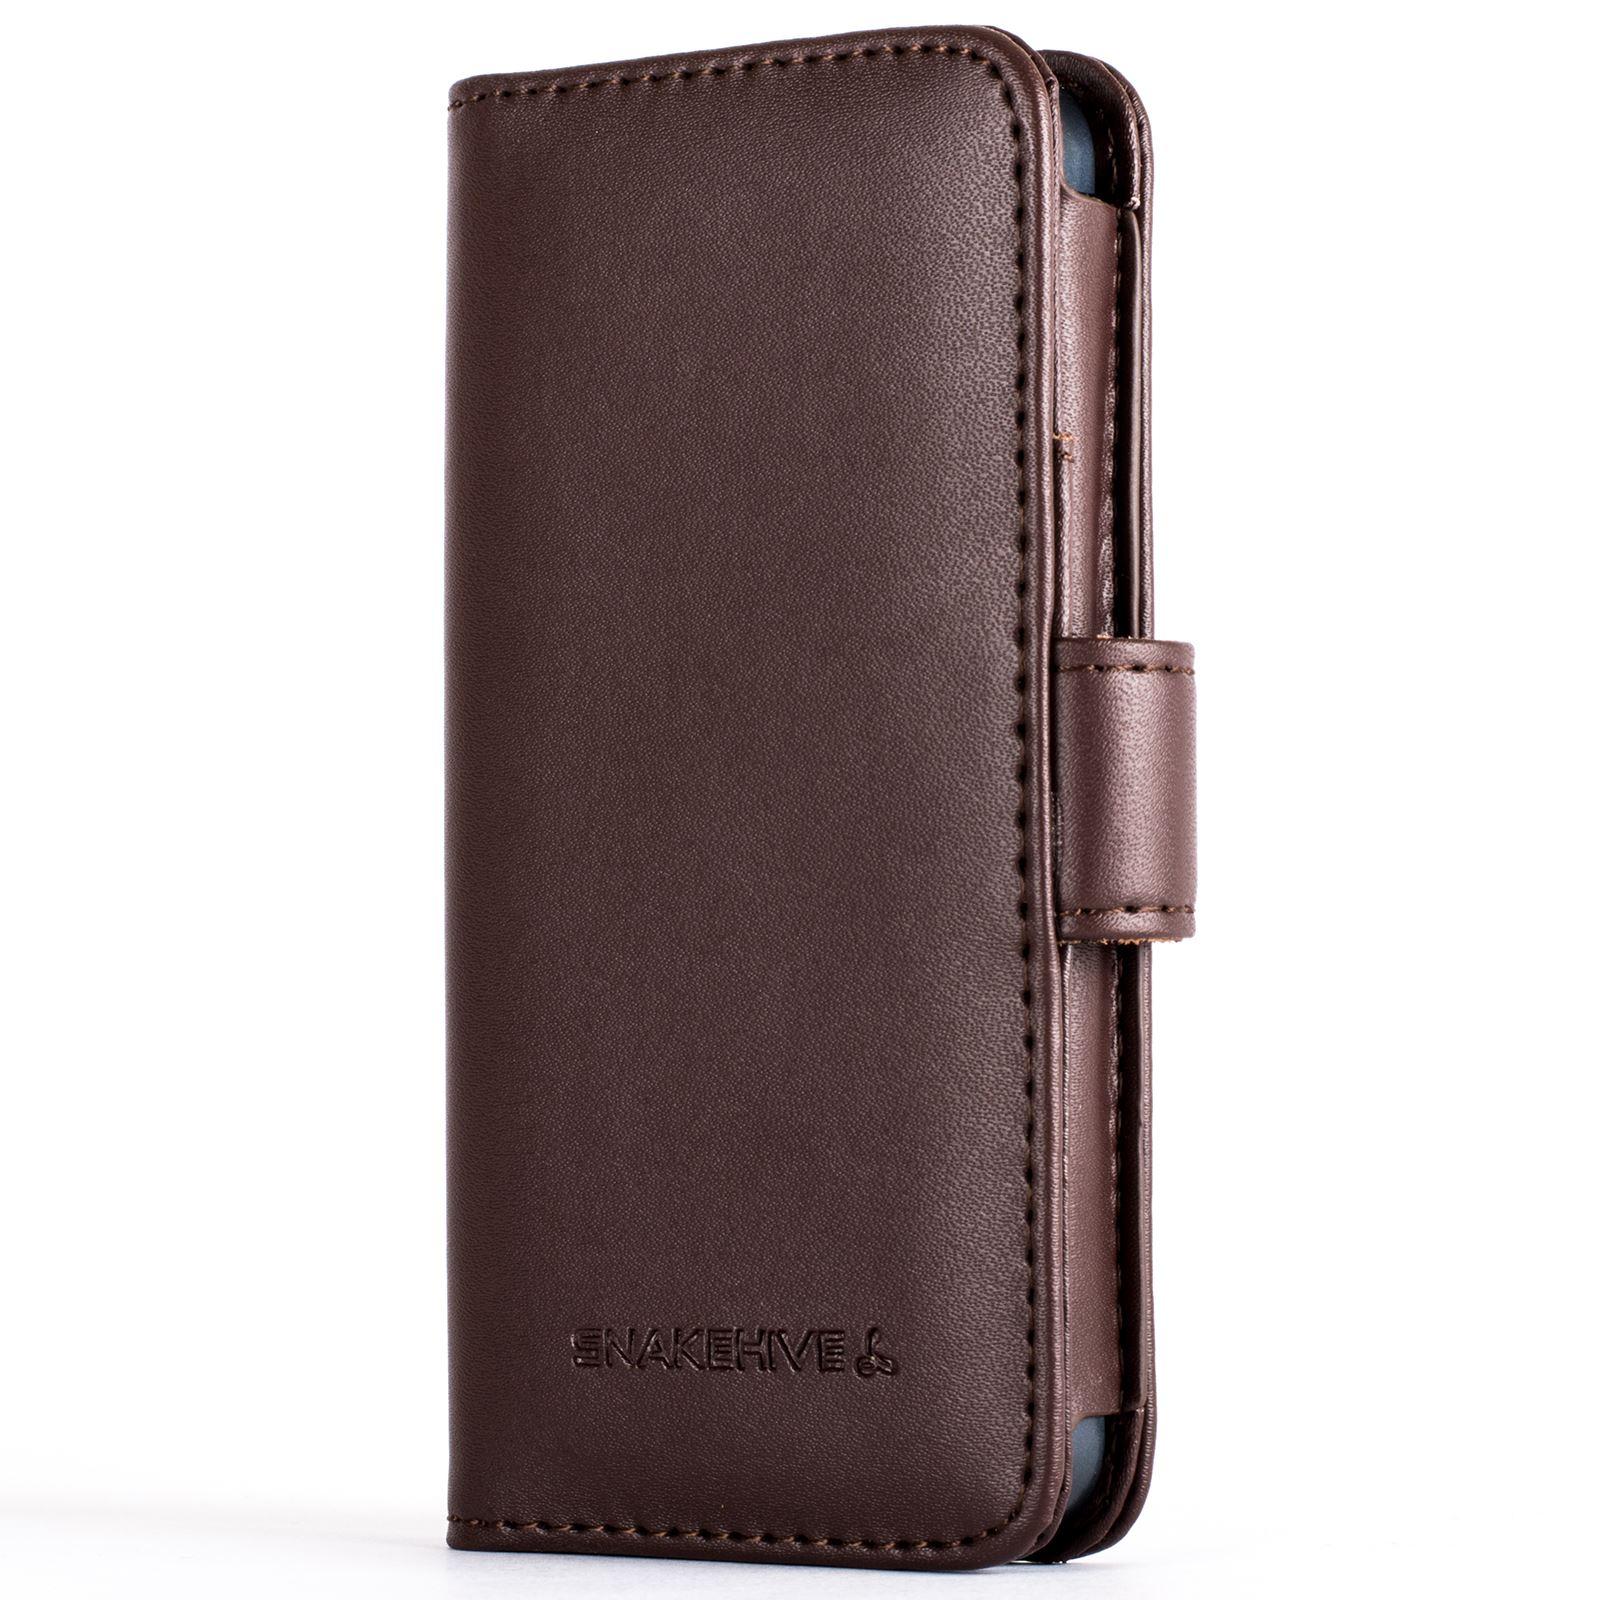 snakehive premium leather wallet flip case cover for. Black Bedroom Furniture Sets. Home Design Ideas